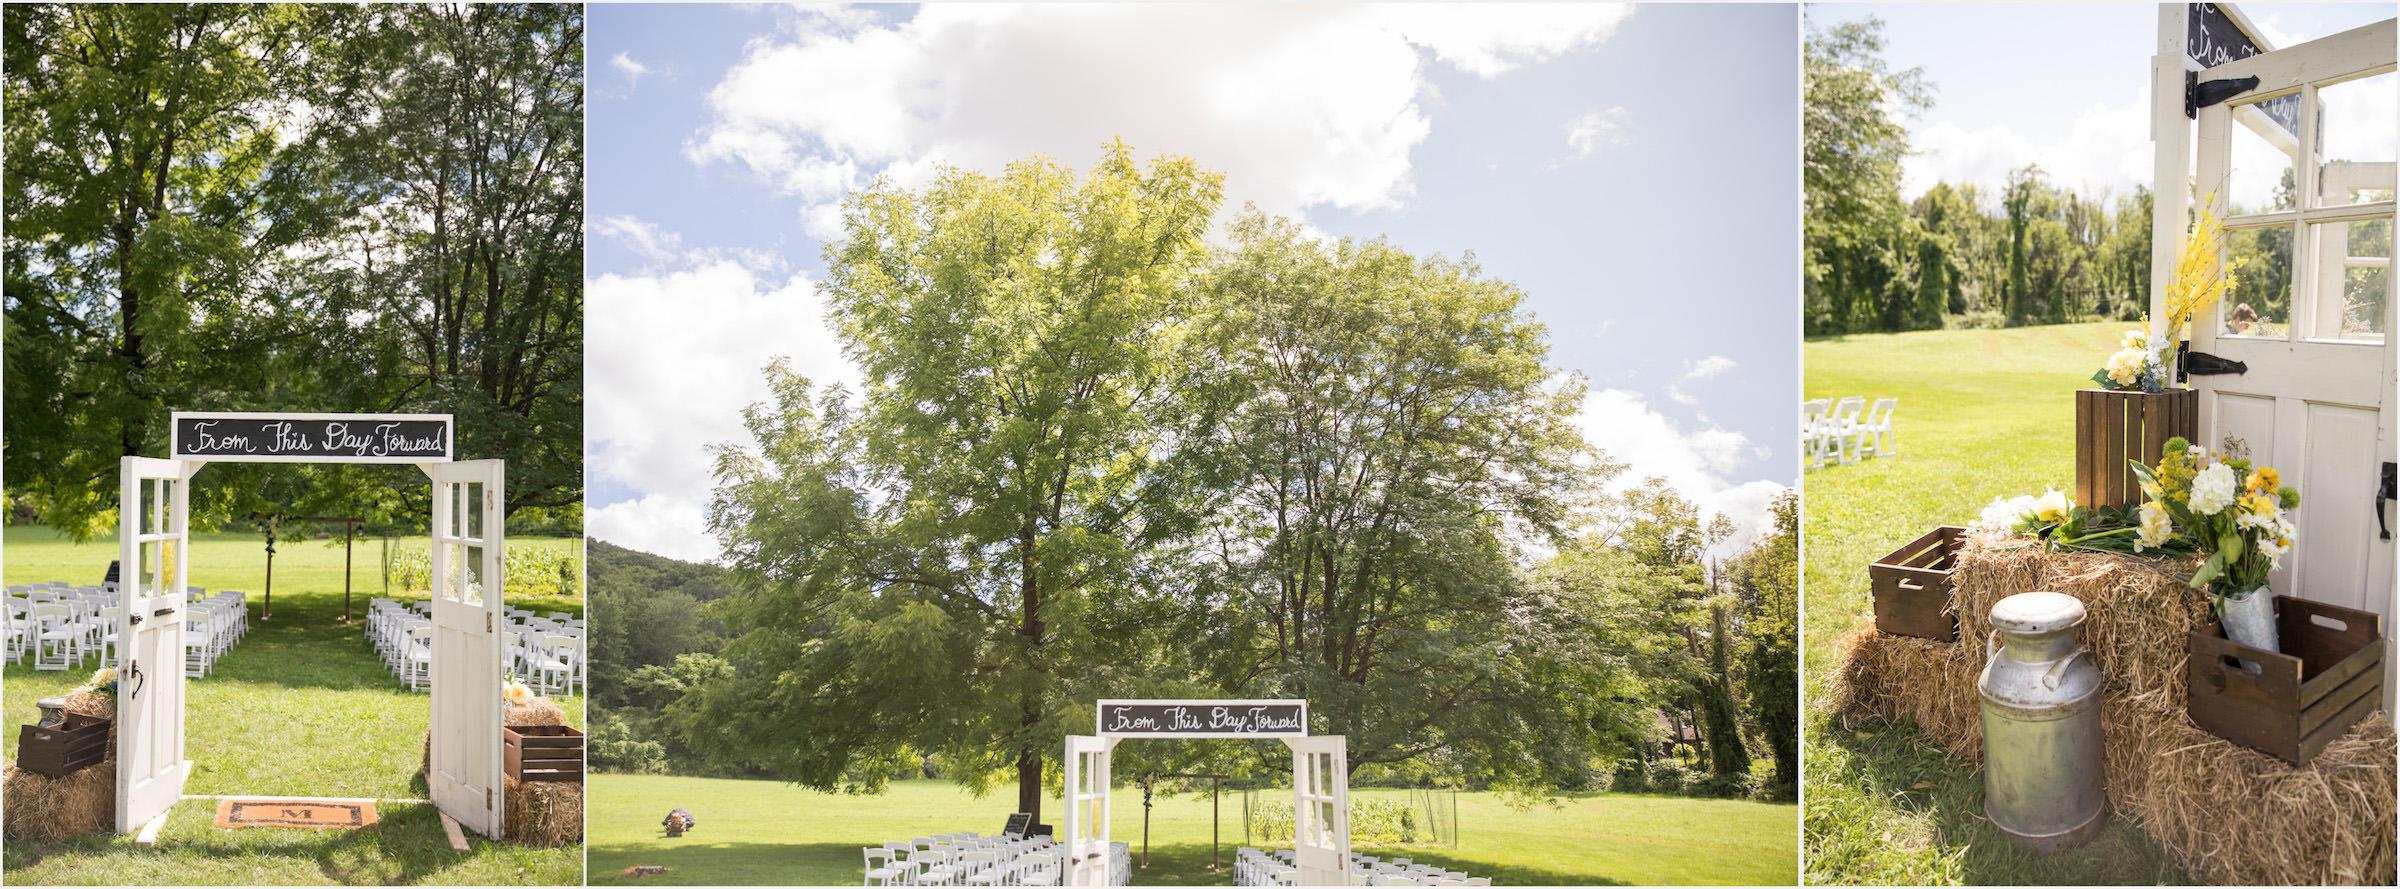 Cassondre Mae Photography Warwick NY Wedding Photographer -5.jpg